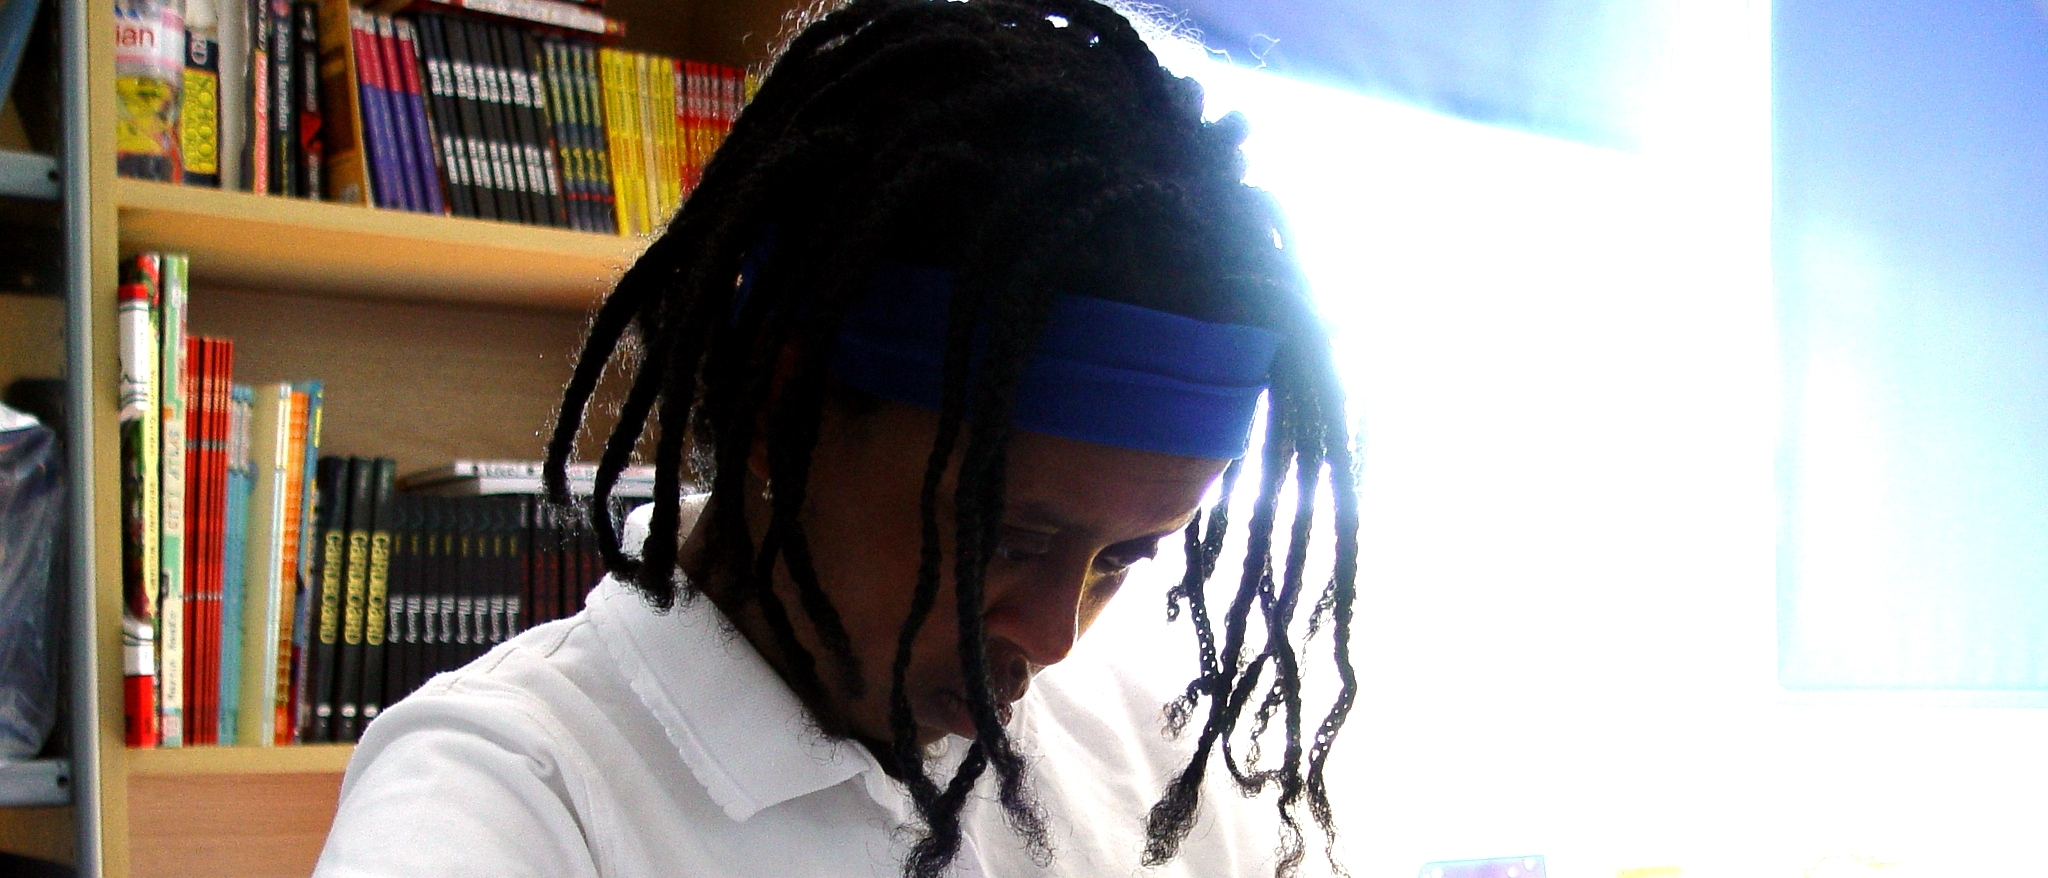 Class 9TD Poetry Recordings